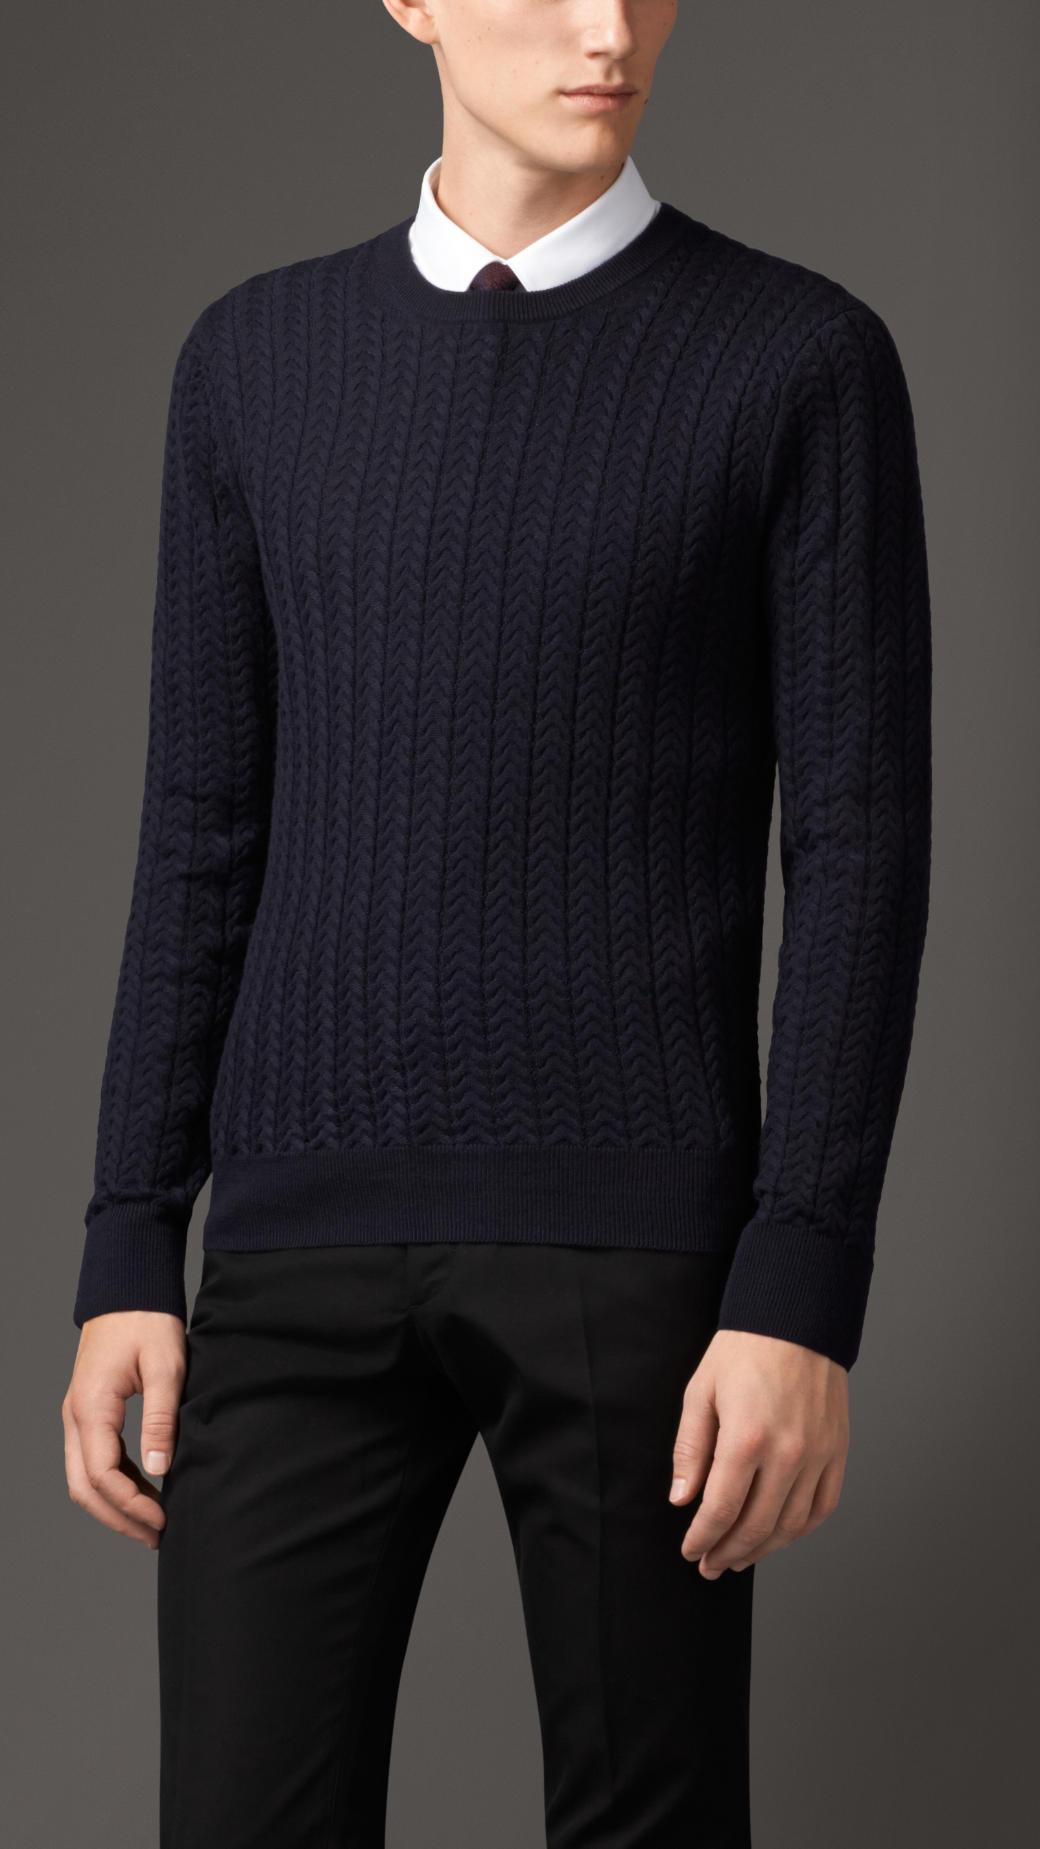 Wool Sweater Grey: Burberry Aran Knit Wool Cashmere Sweater In Blue For Men